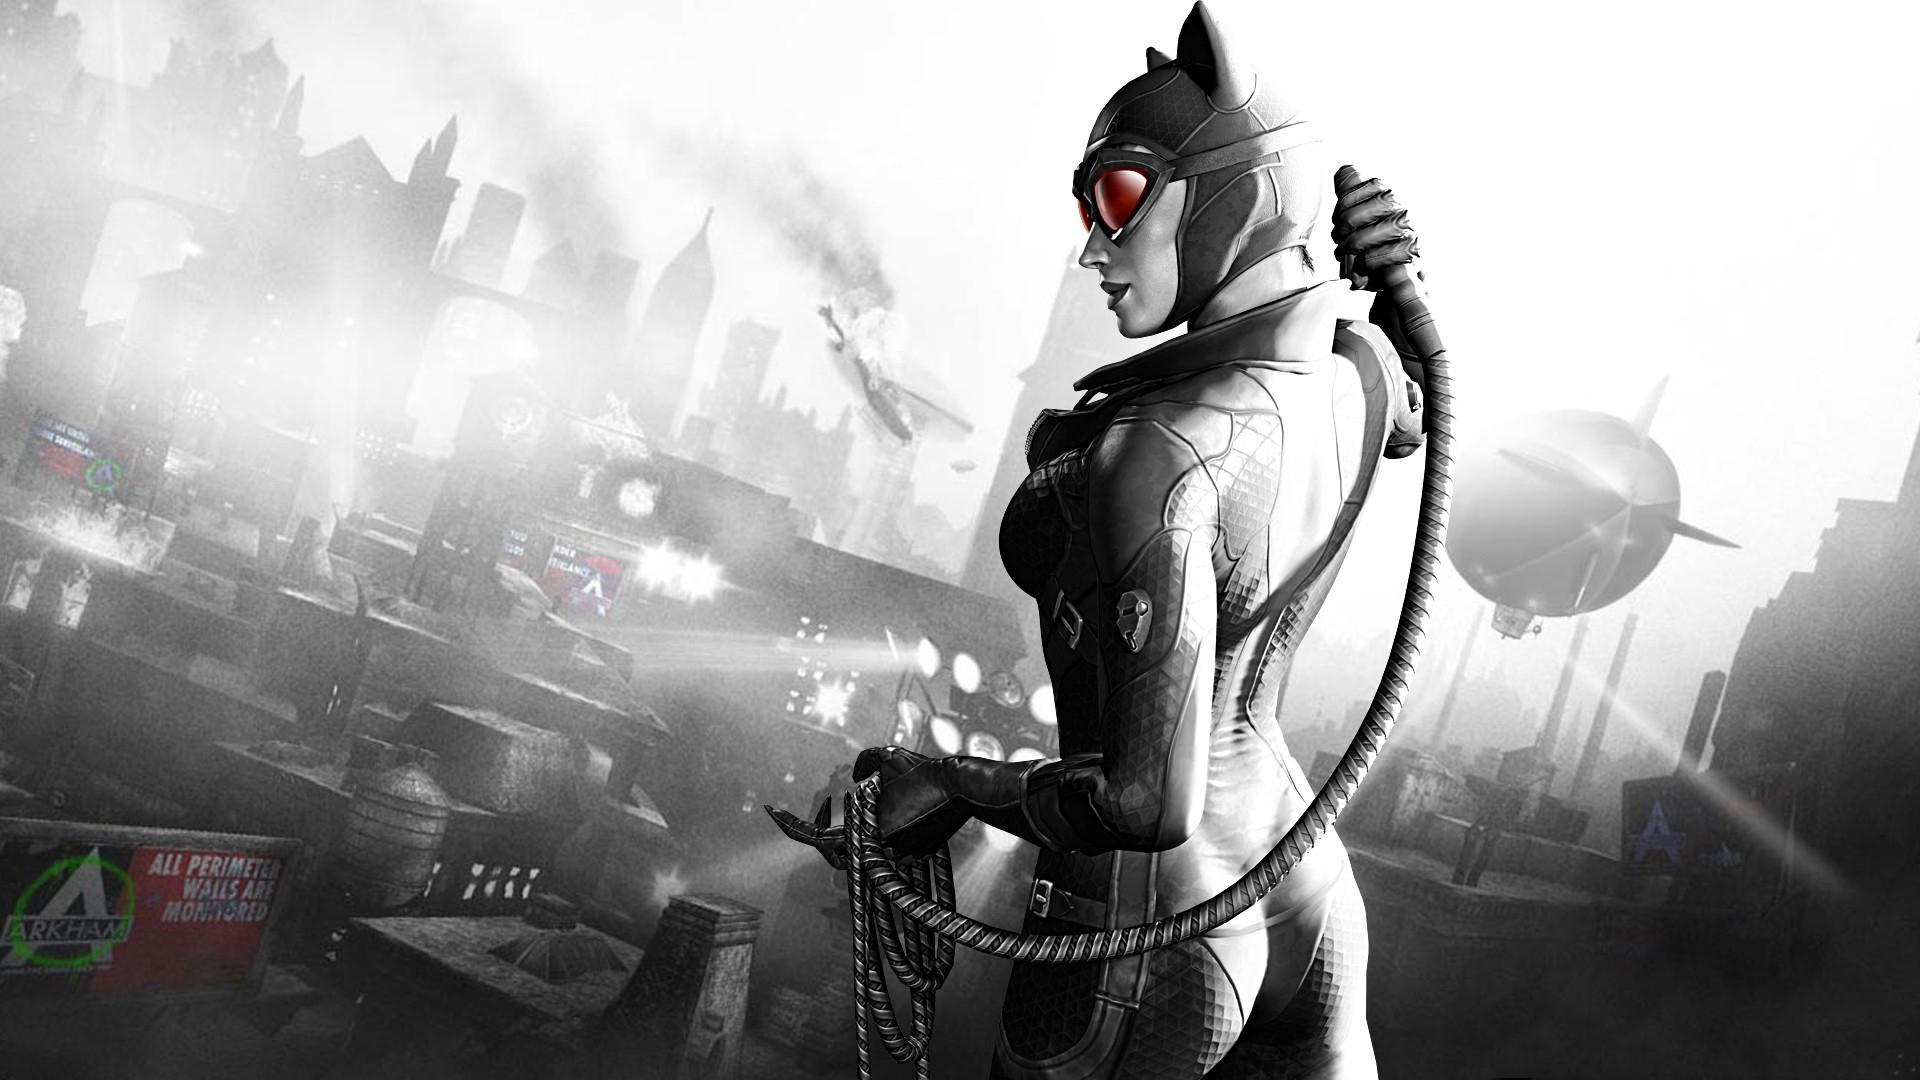 Wallpaper Batman Arkham City Catwoman Girl City Airship Black